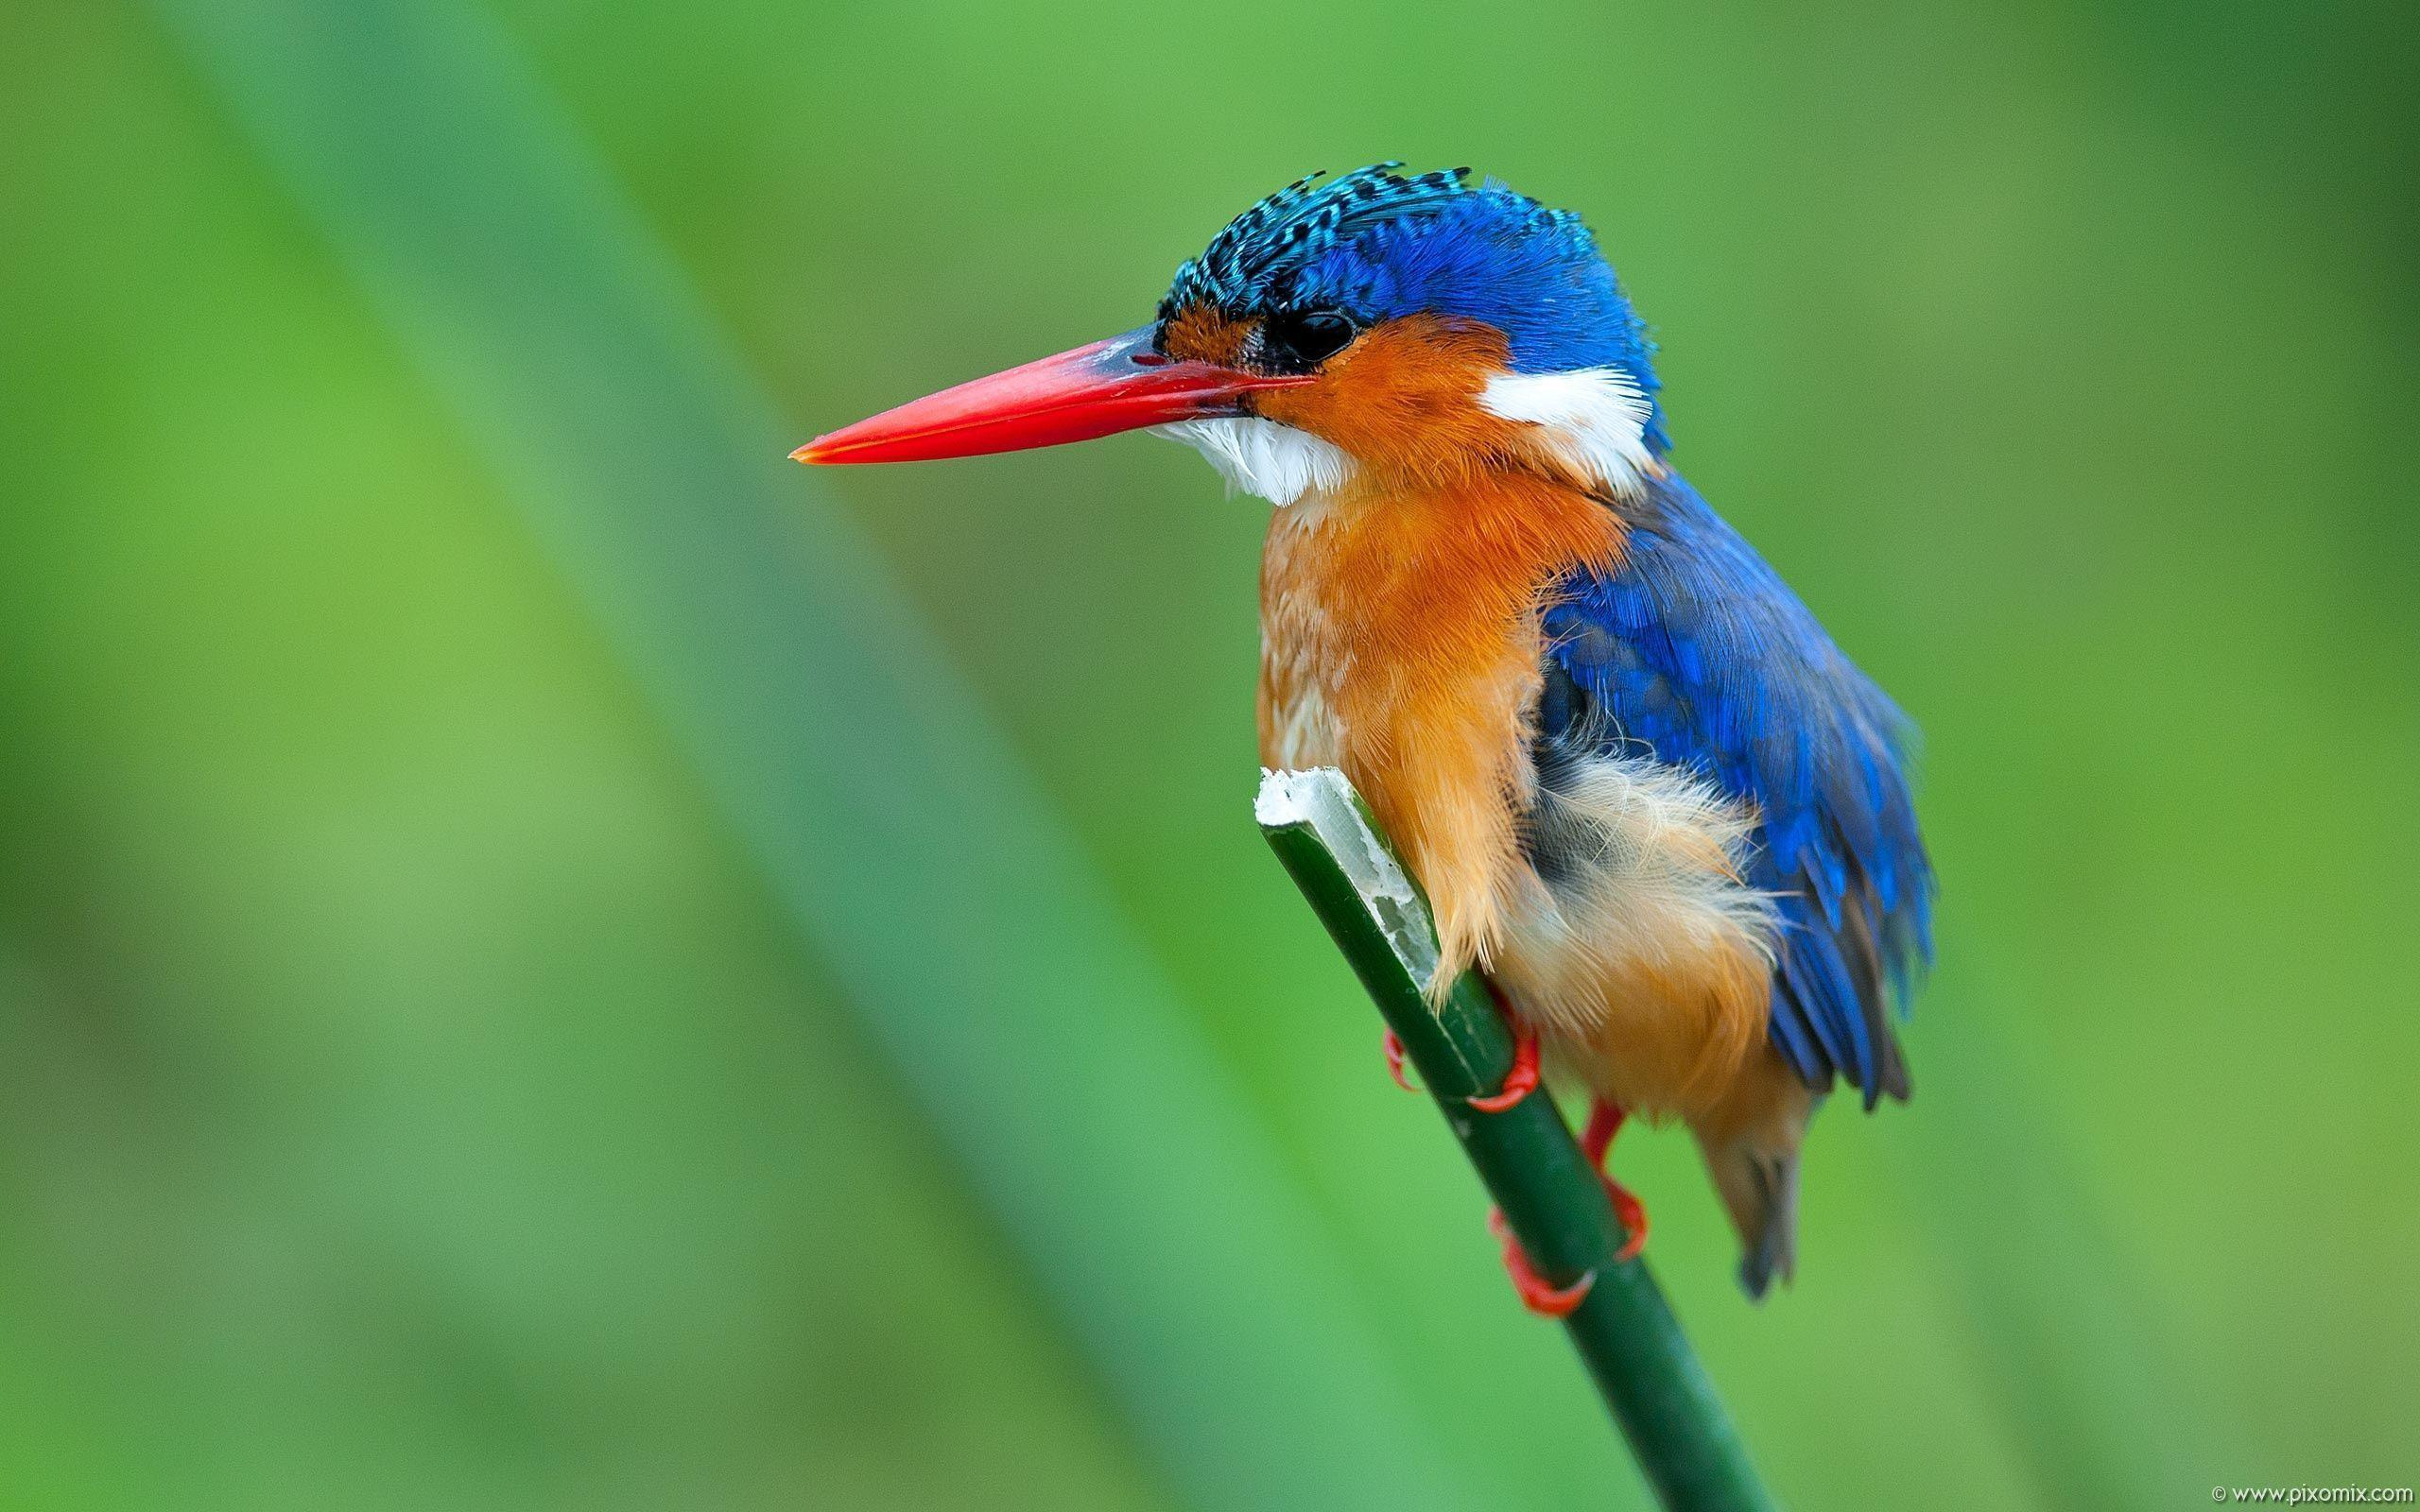 kingfisher wallpapers hd - photo #5